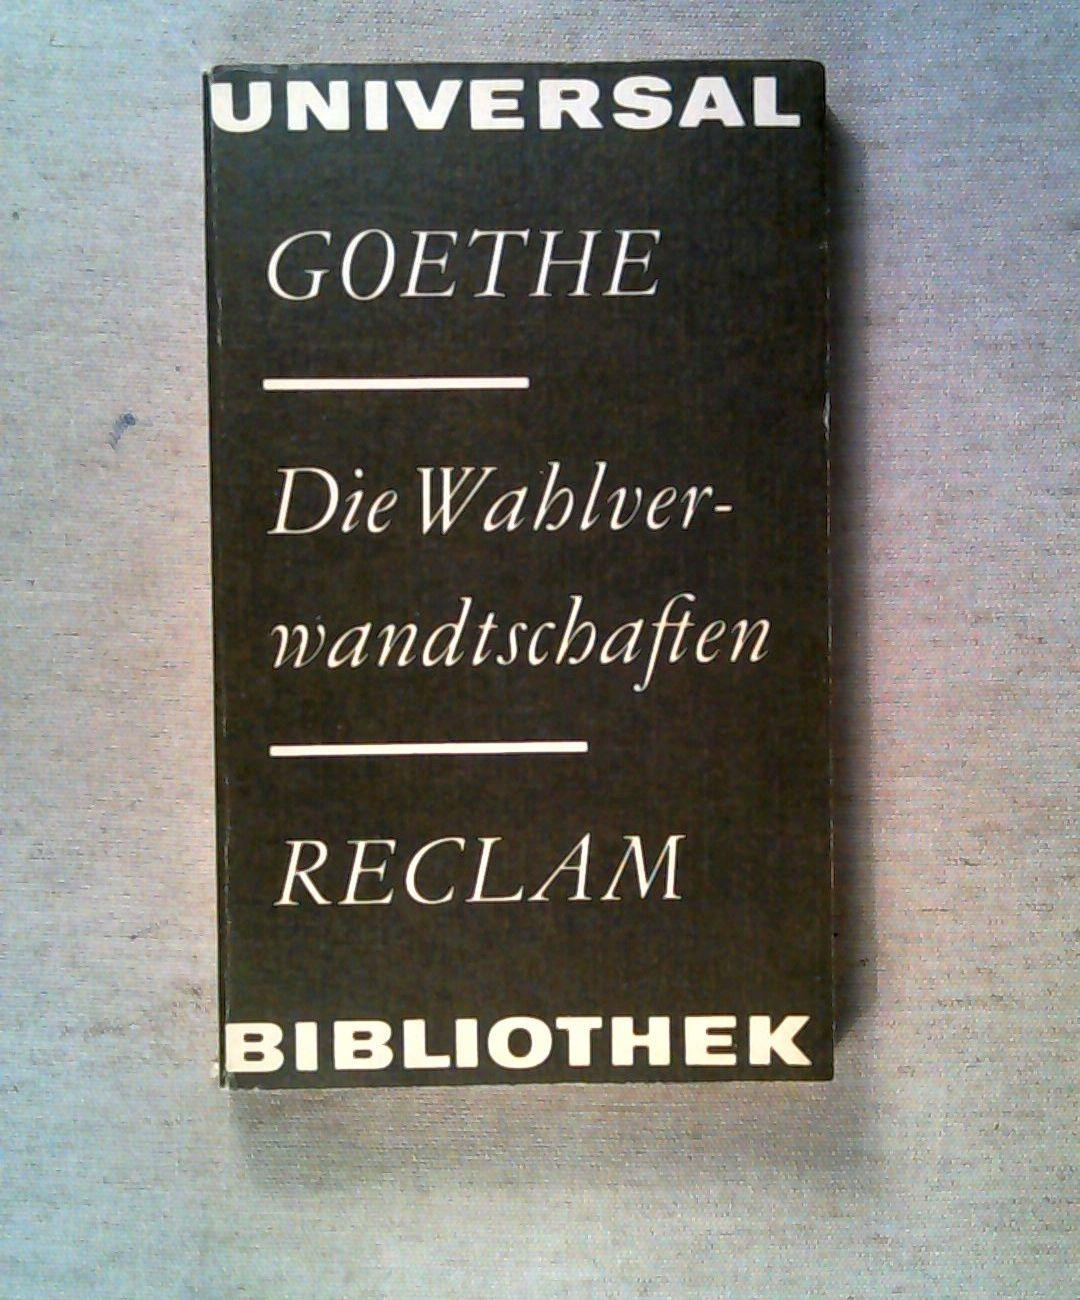 Die Wahlwanderschaften (Universal Bibliothek Band 420).: Goethe